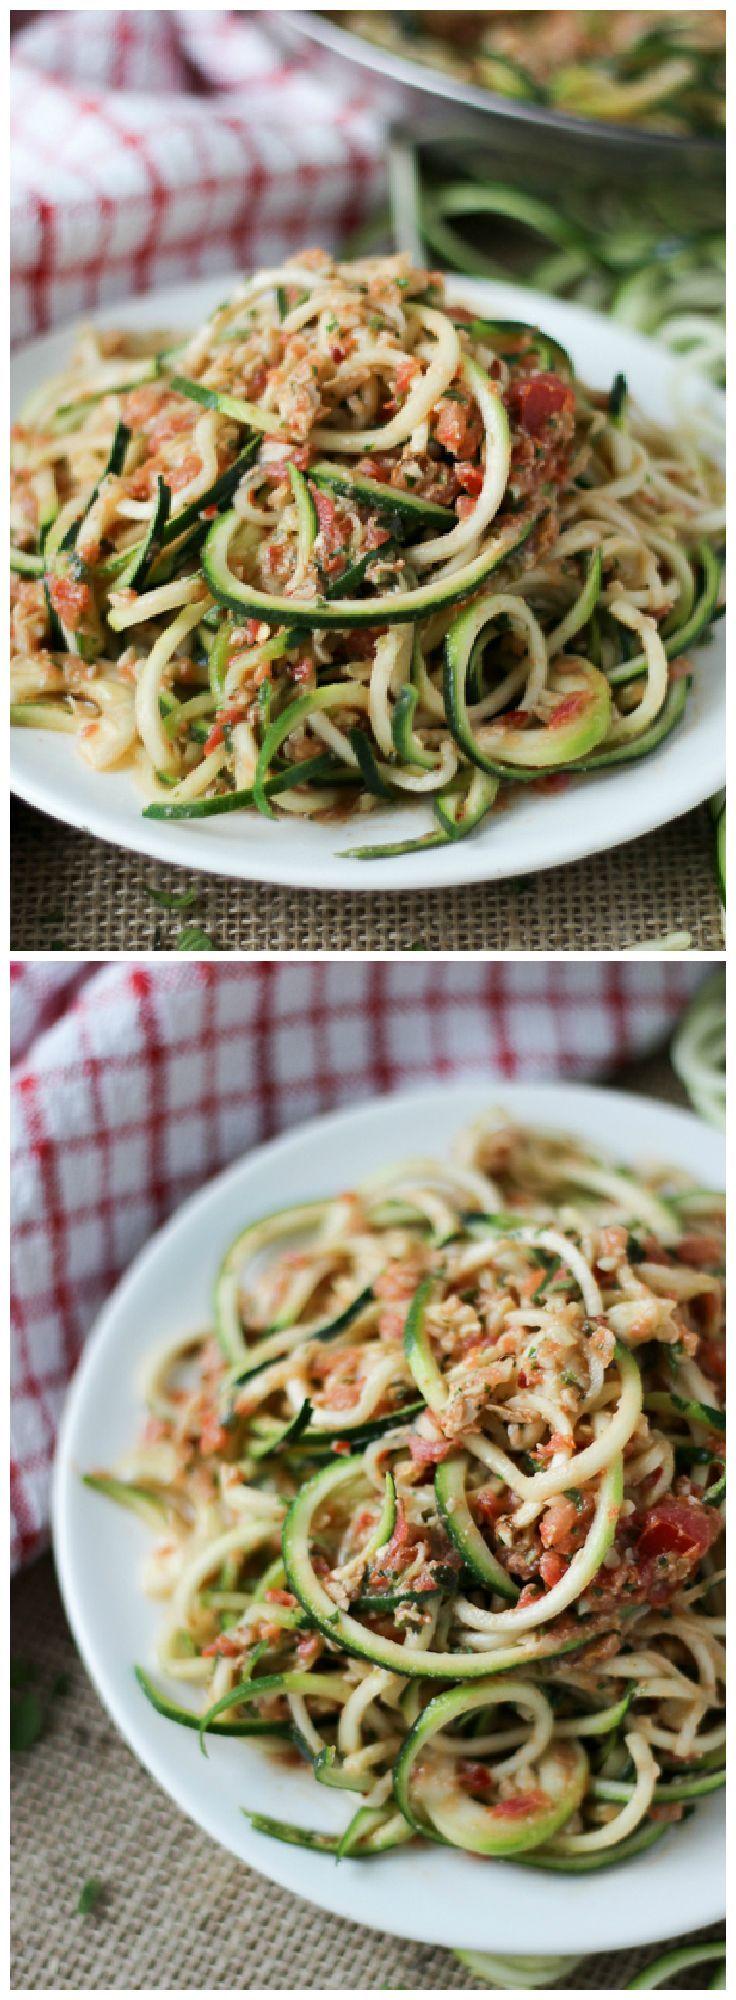 Spiralized Zucchini Noodles with Mint Pesto